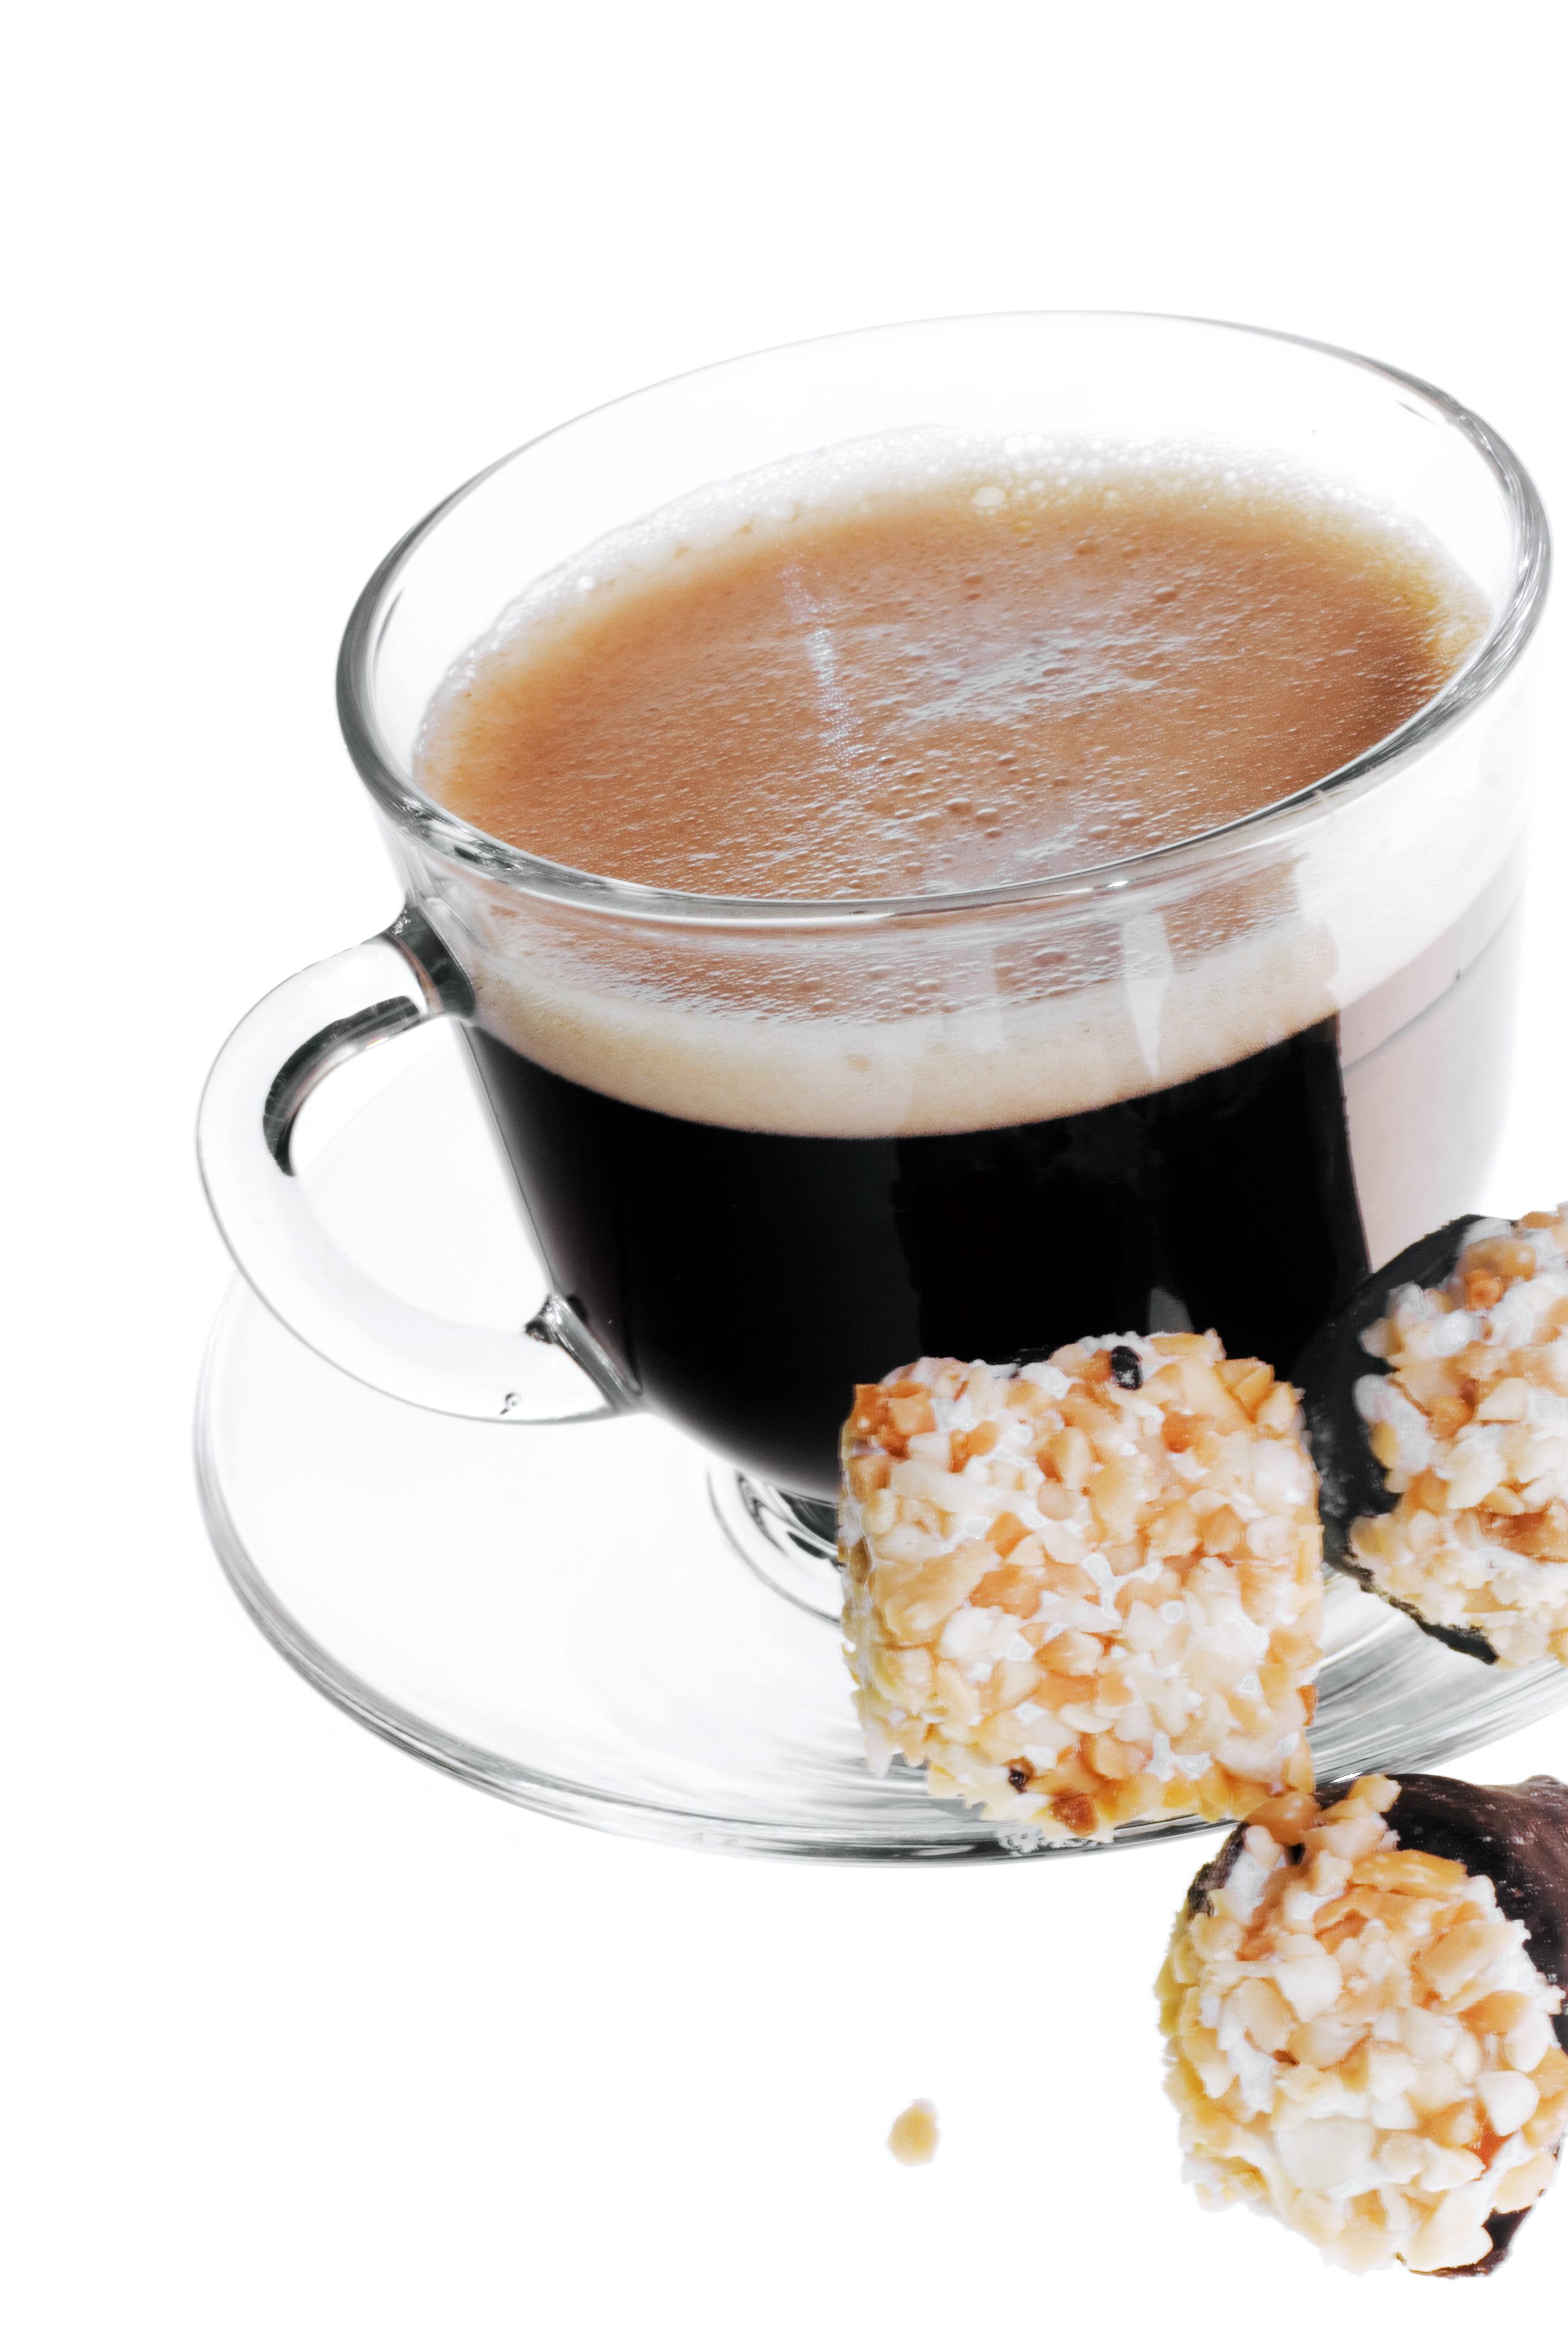 Coffee on white, Beverage, Saucer, Lunch, Mug, HQ Photo